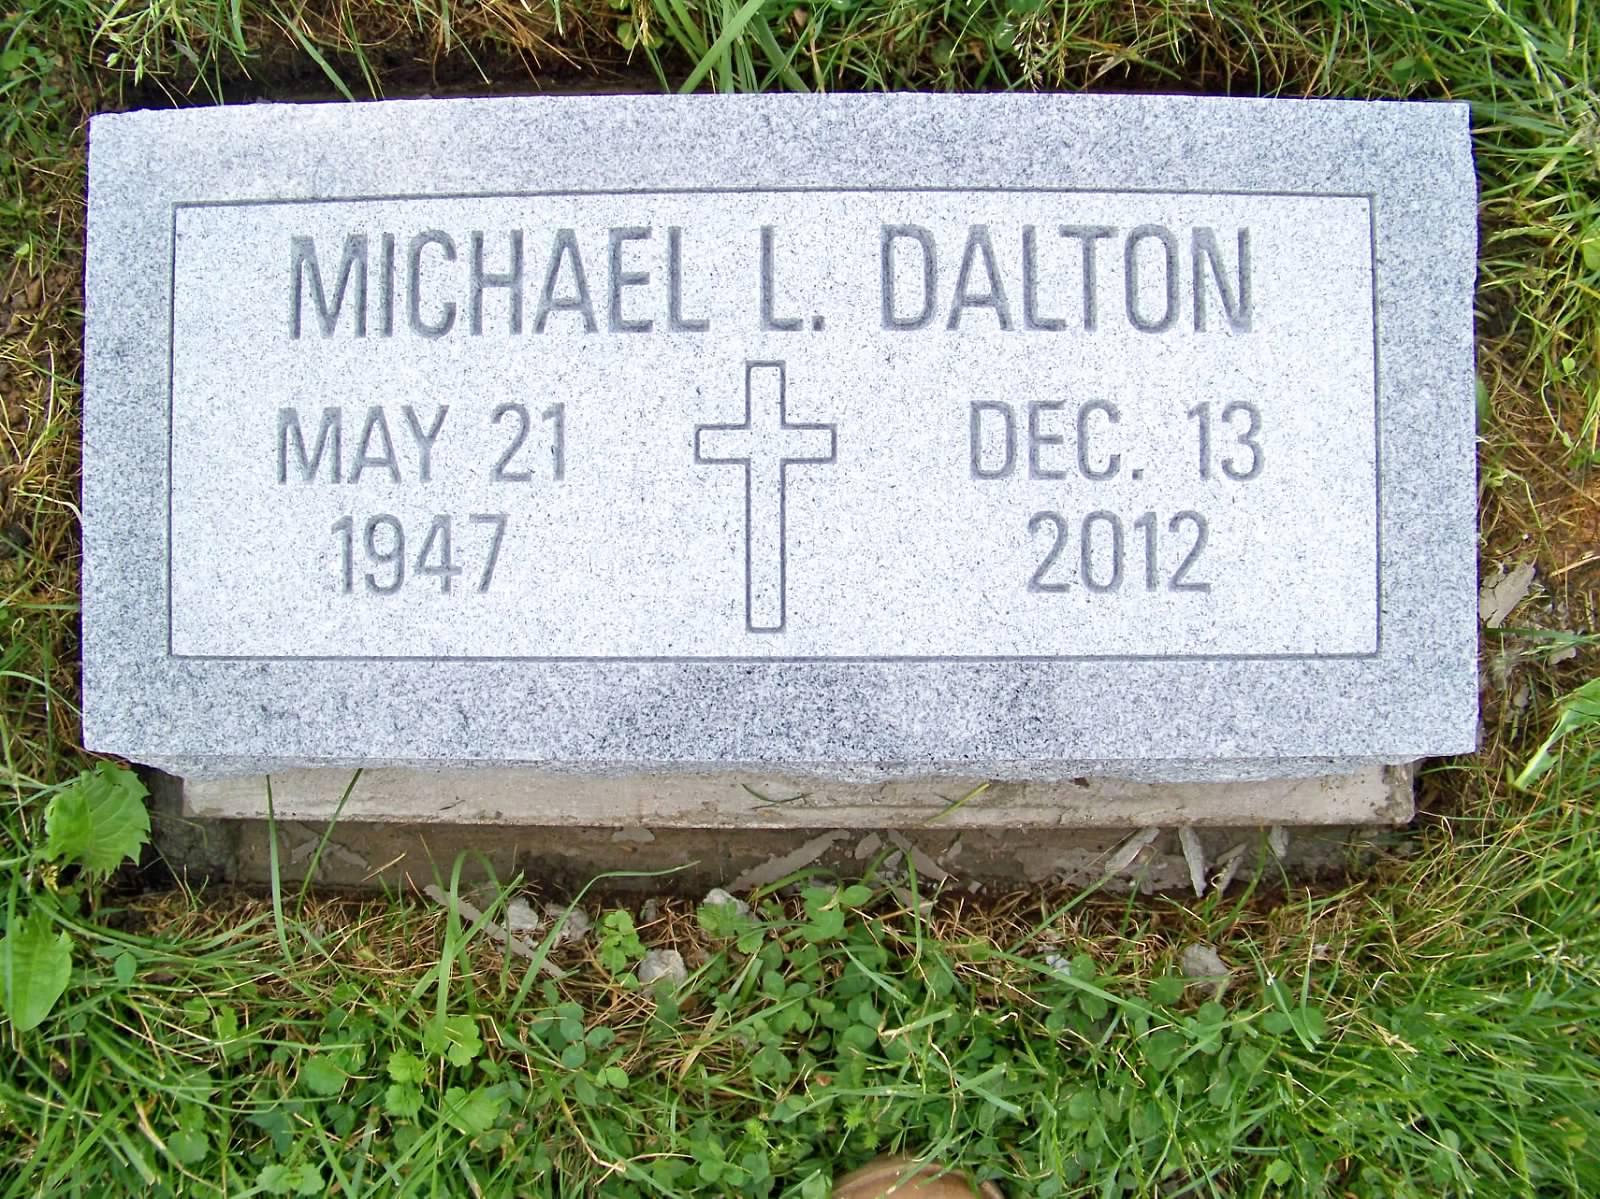 Dalton Bevel Marker